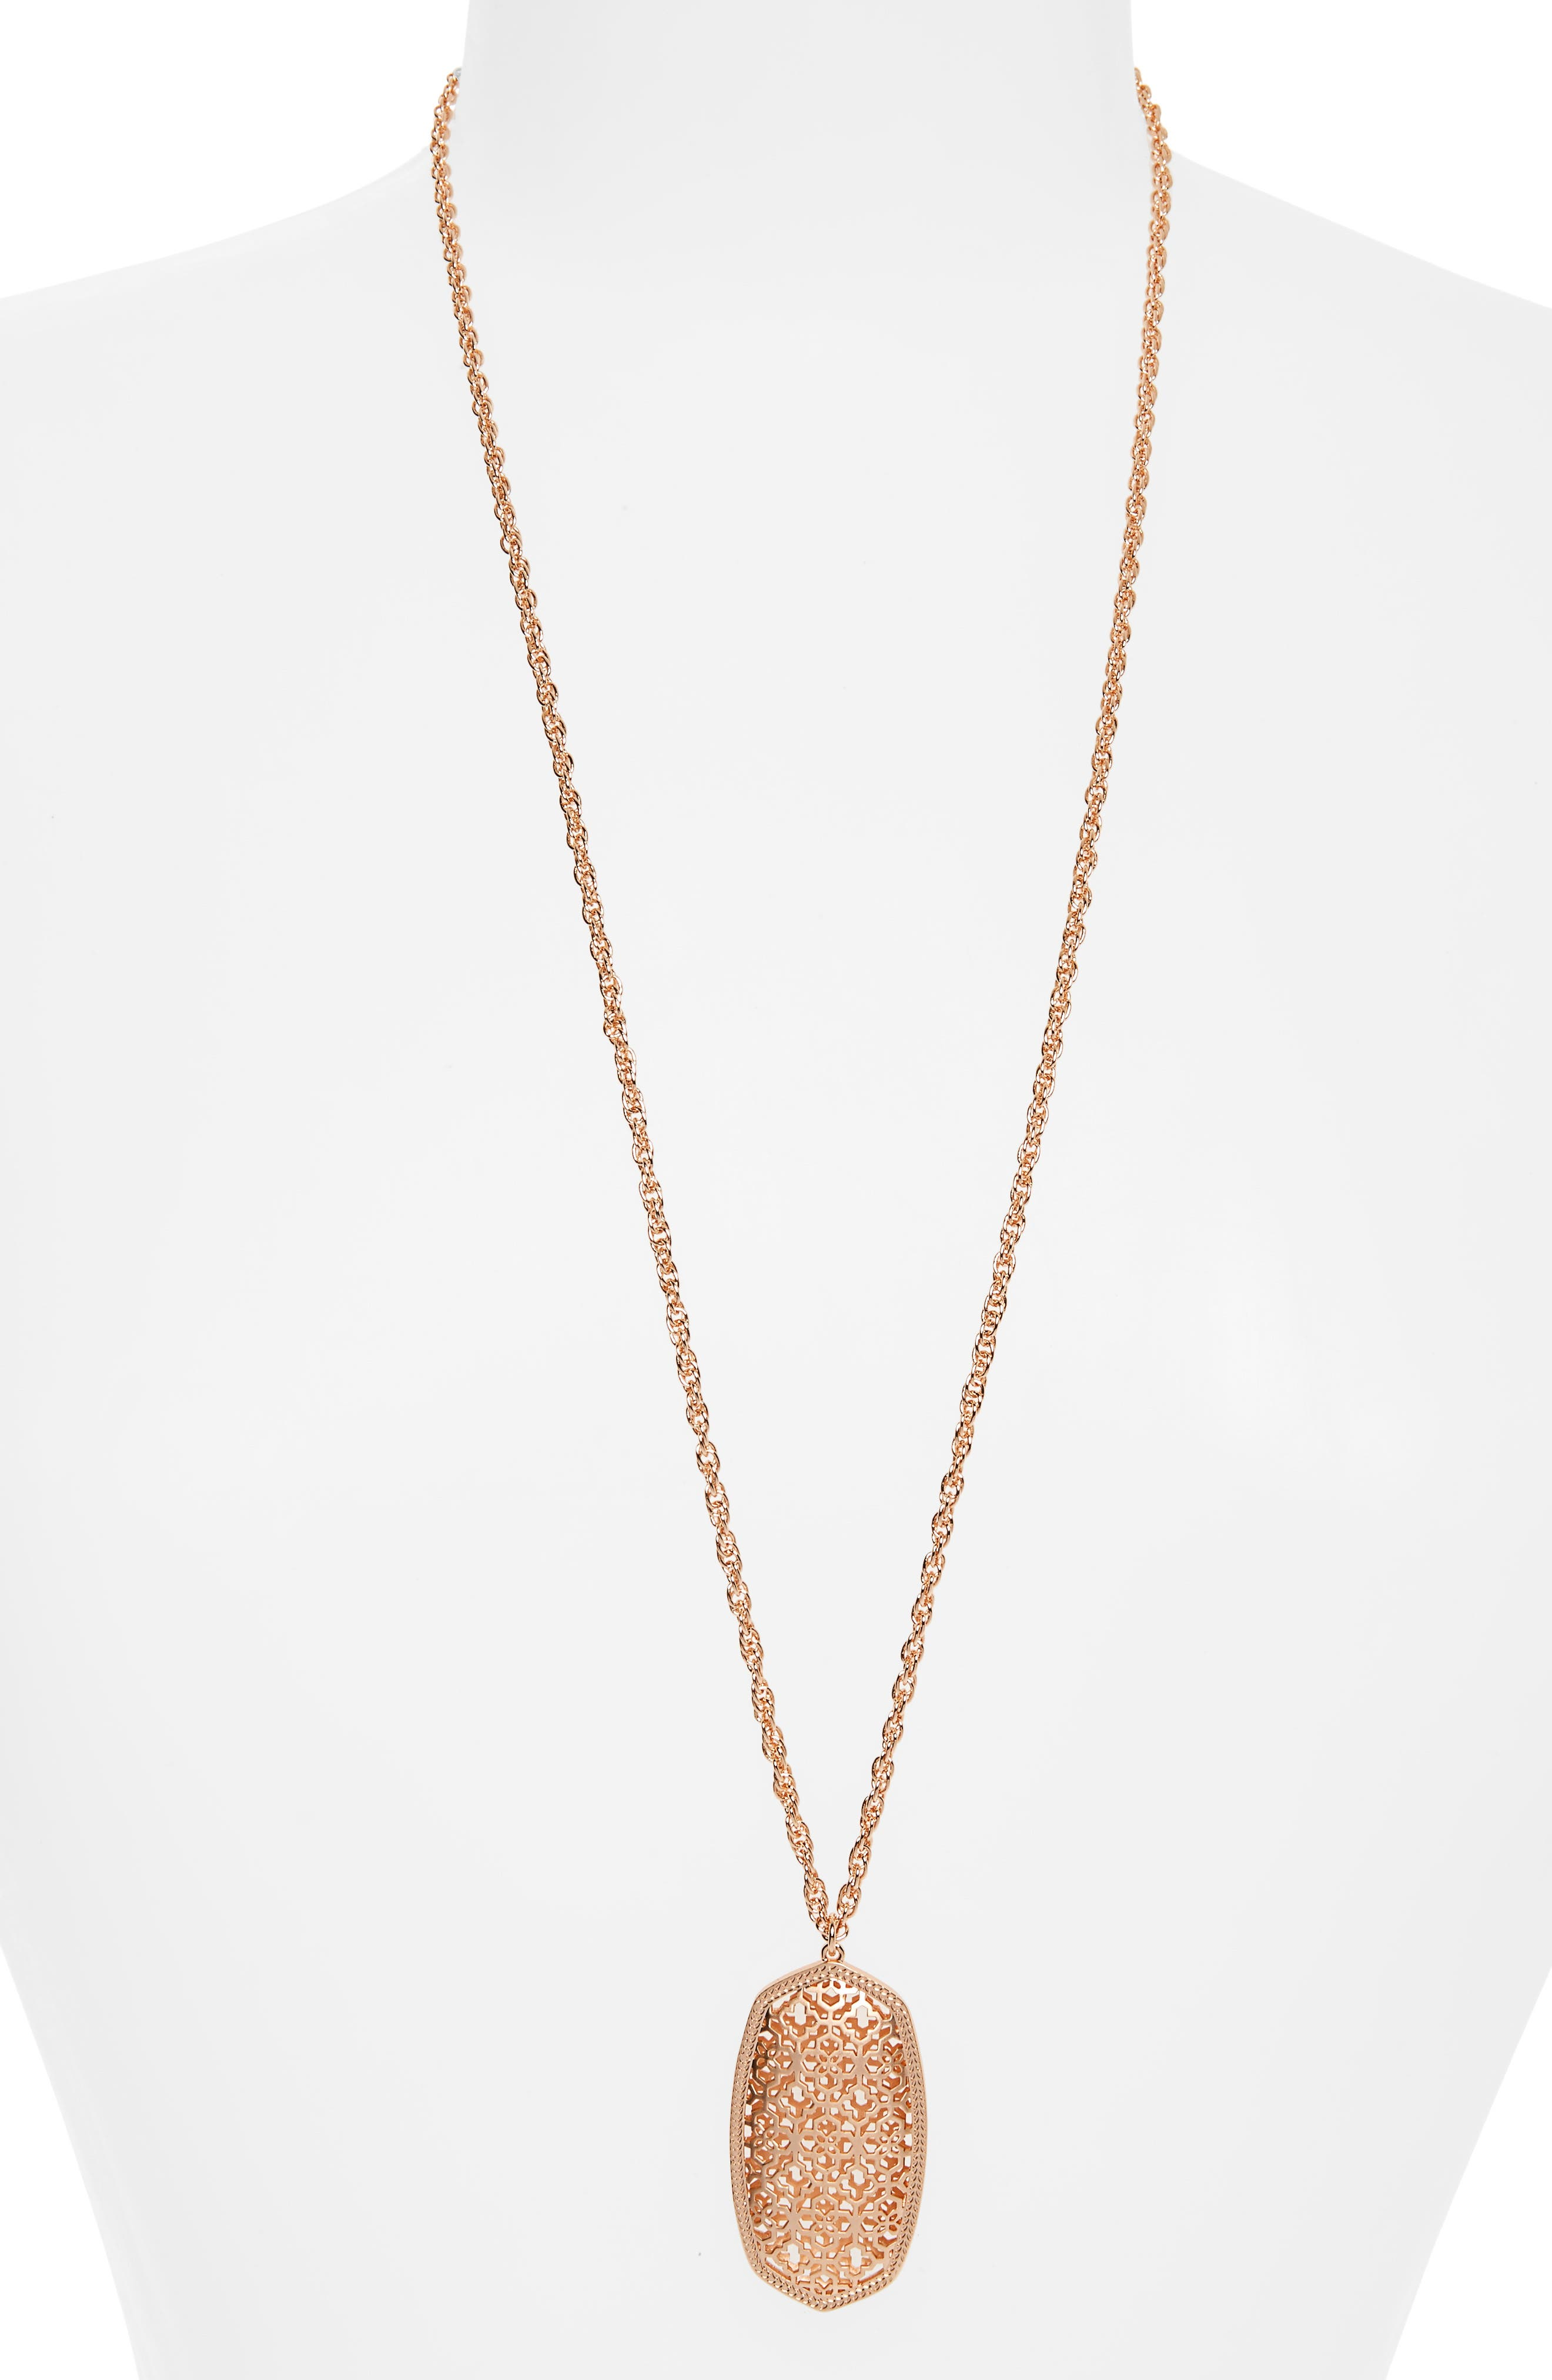 Kendra Scott Rae Long Filigree Pendant Necklace